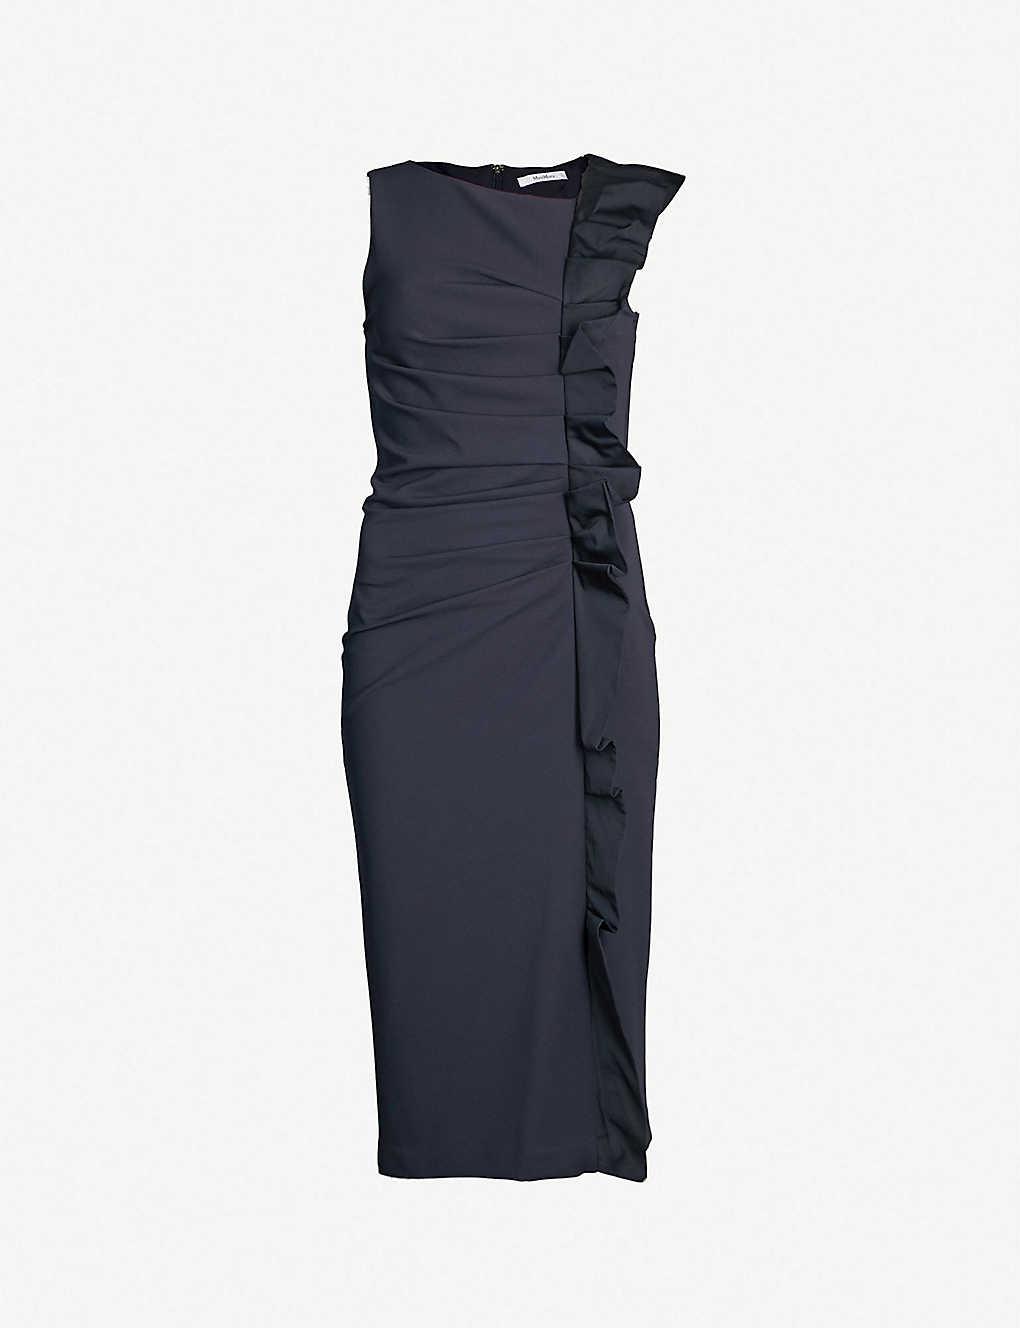 Max Mara Evening Dress